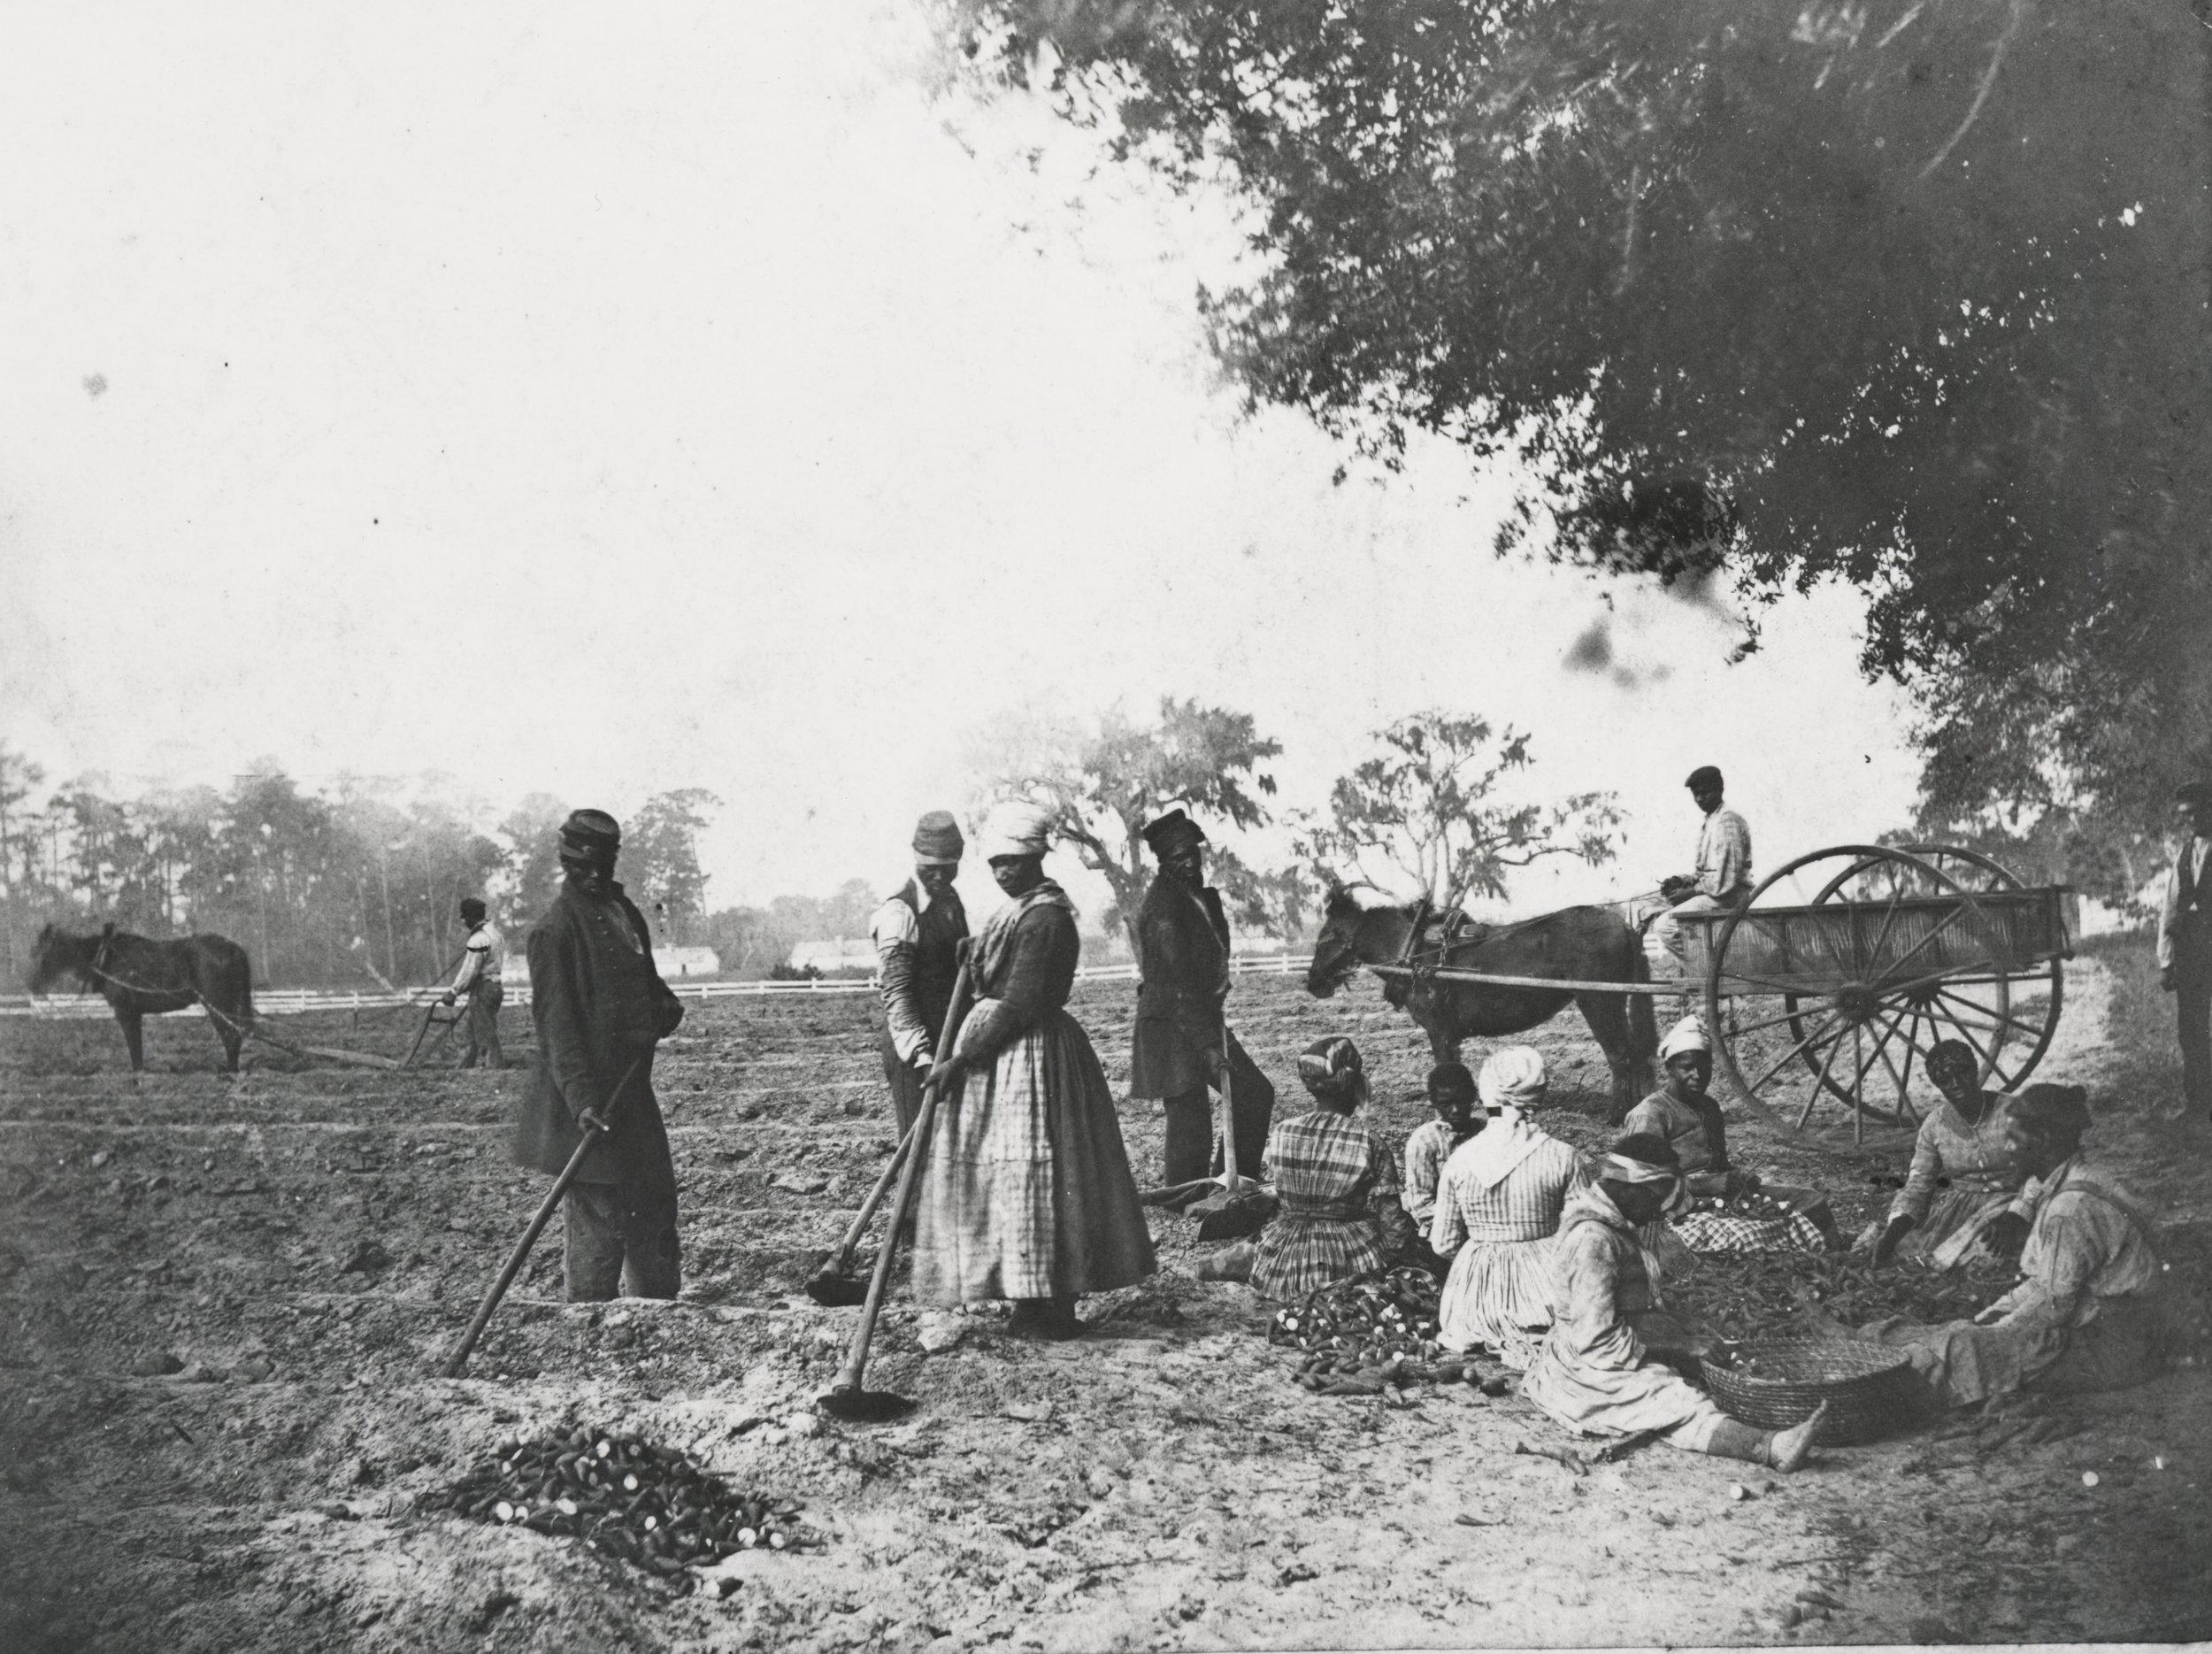 Sweet Potatoe Planting—James Hopkinson's Plantation, Courtesy of the Library of Congress